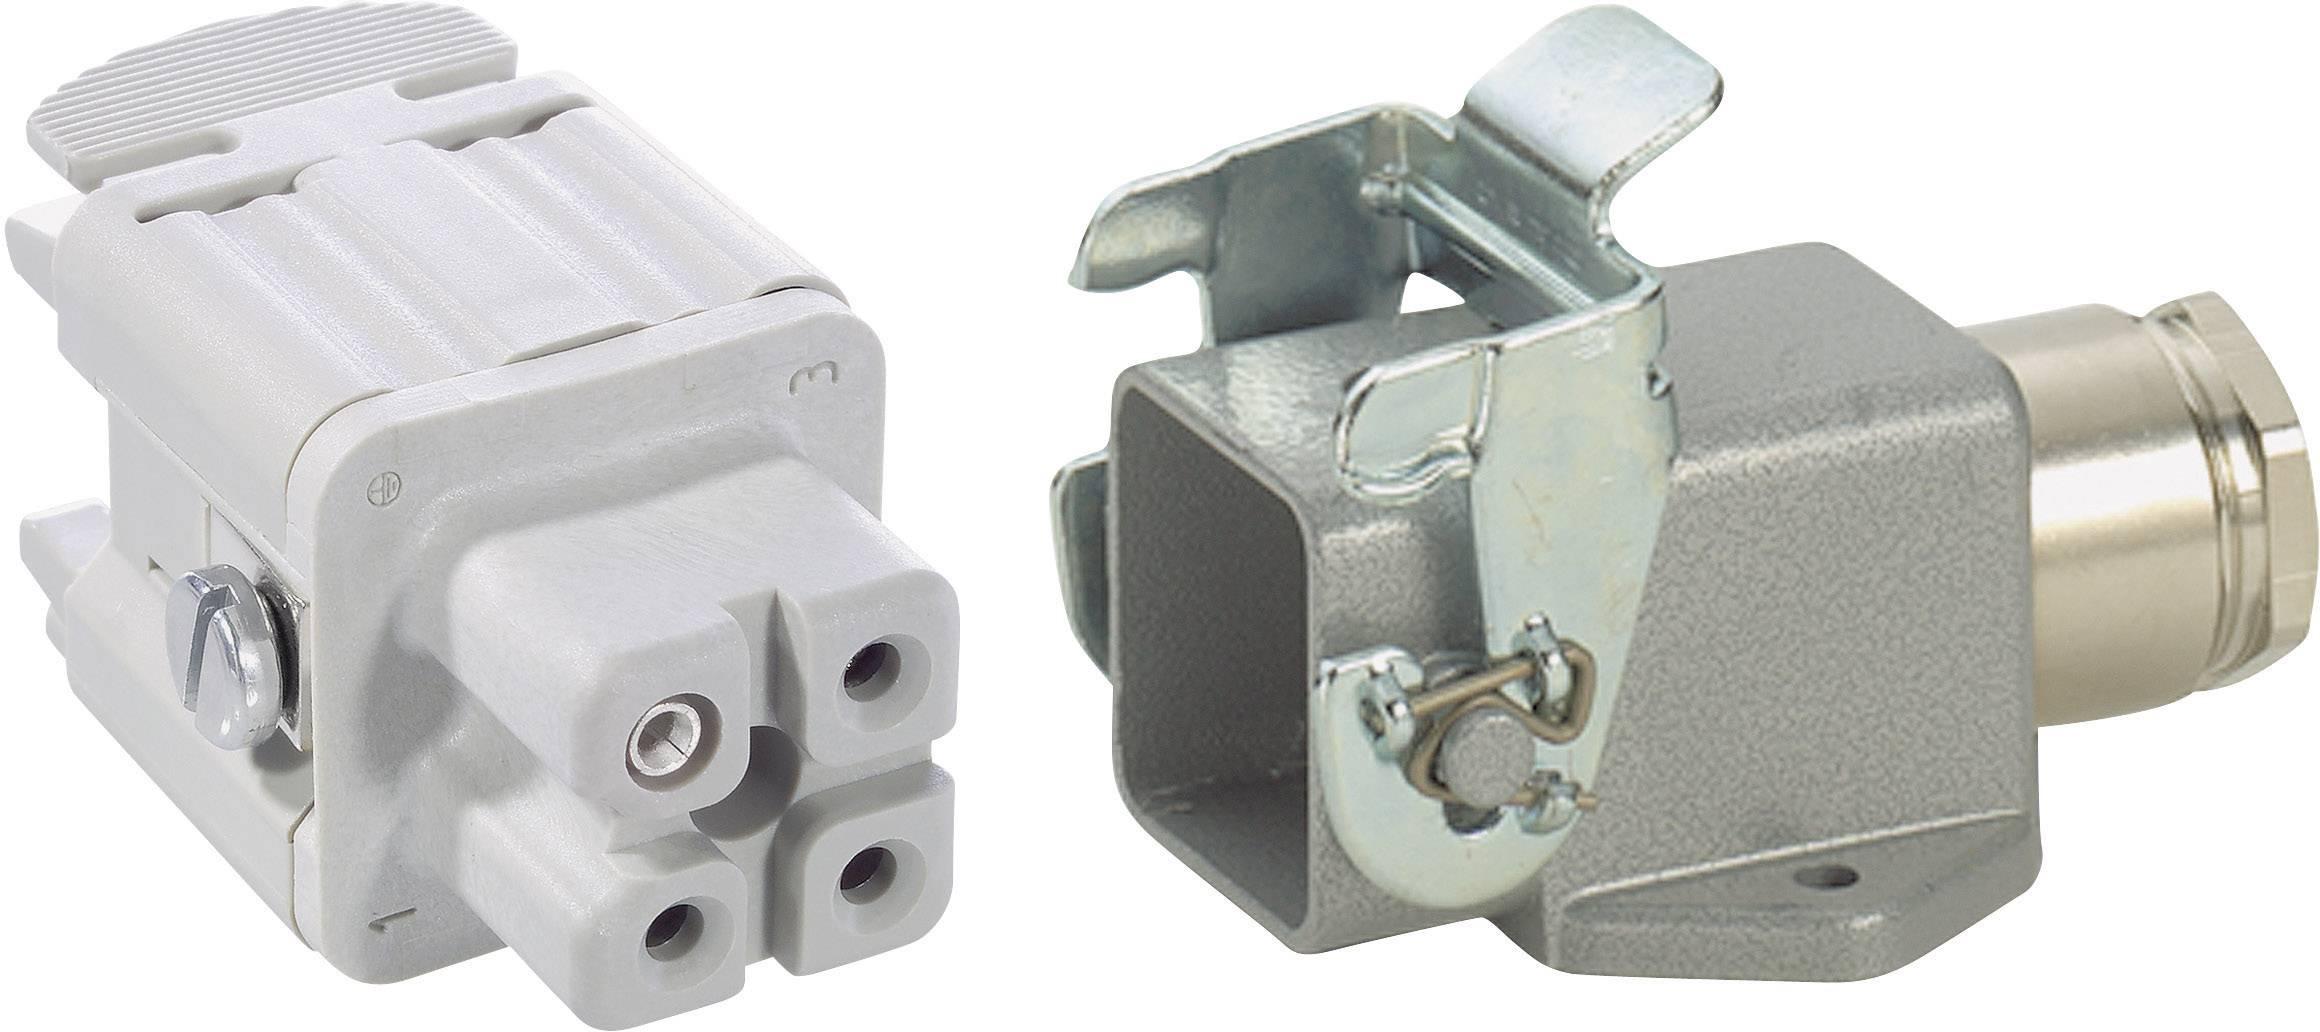 Sada konektoru EPIC®KIT H-A 3 75009610 LAPP 3 + PE šroubovací 1 sada